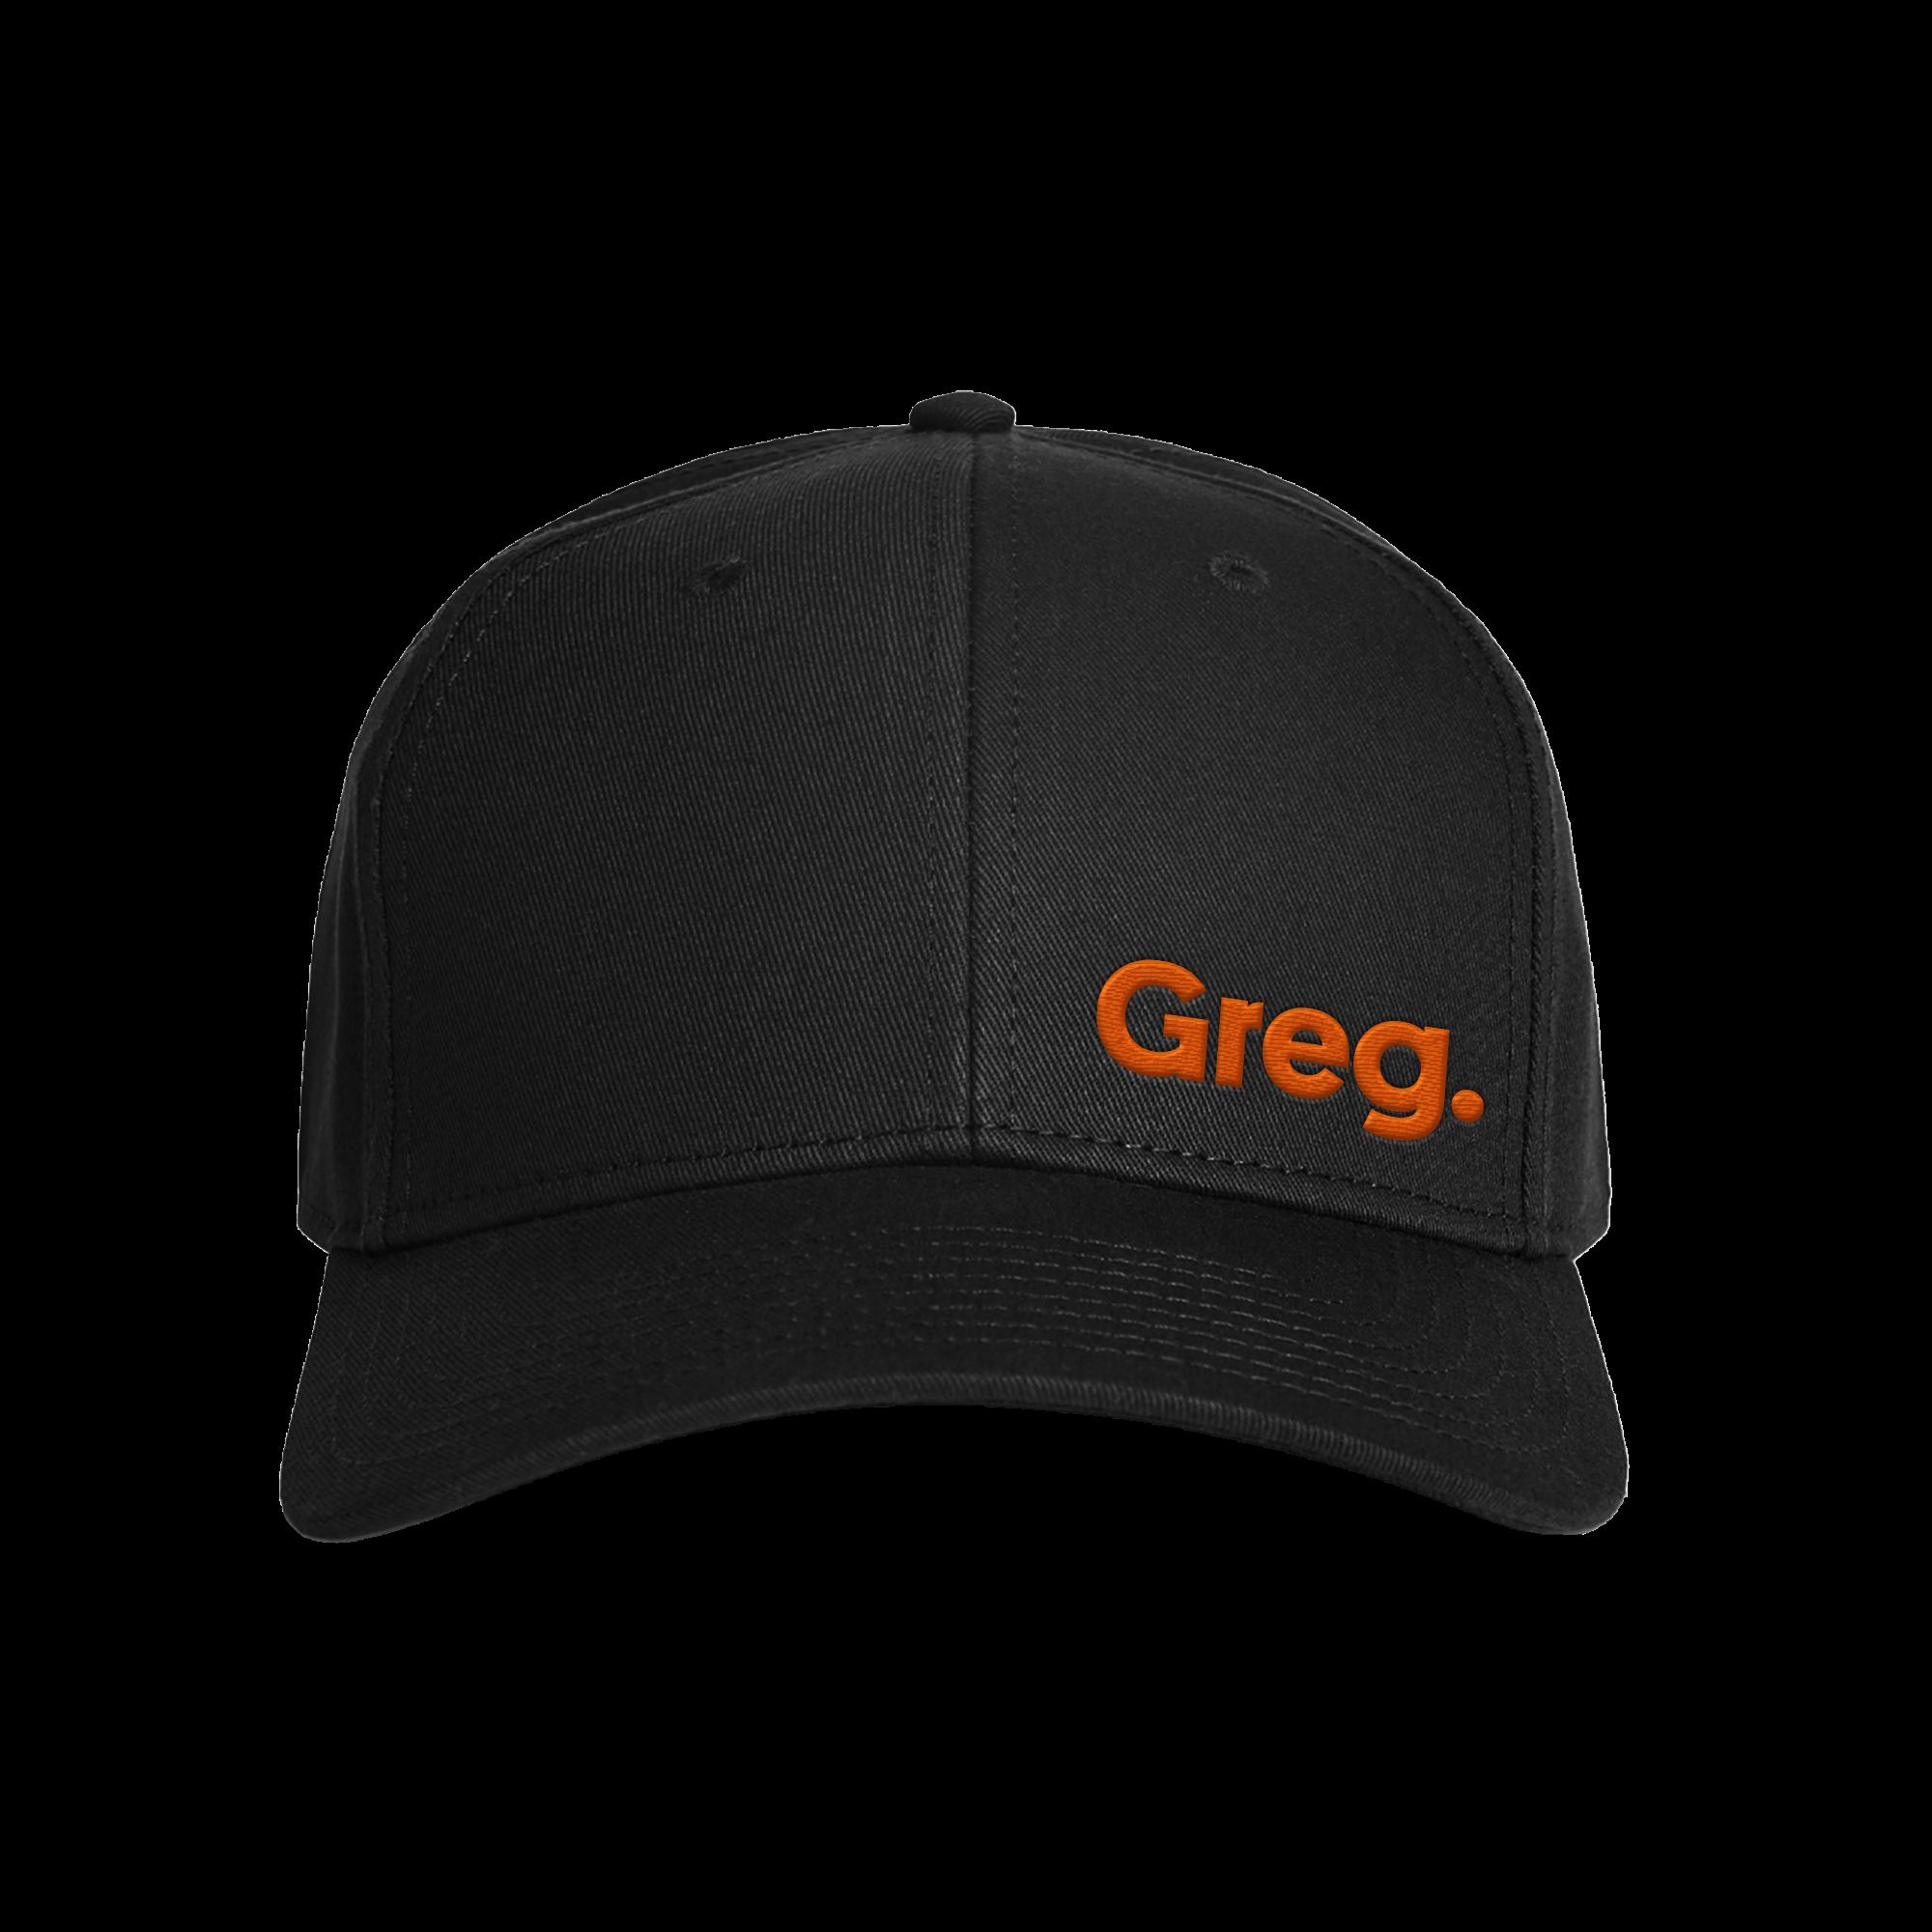 Greg Cap